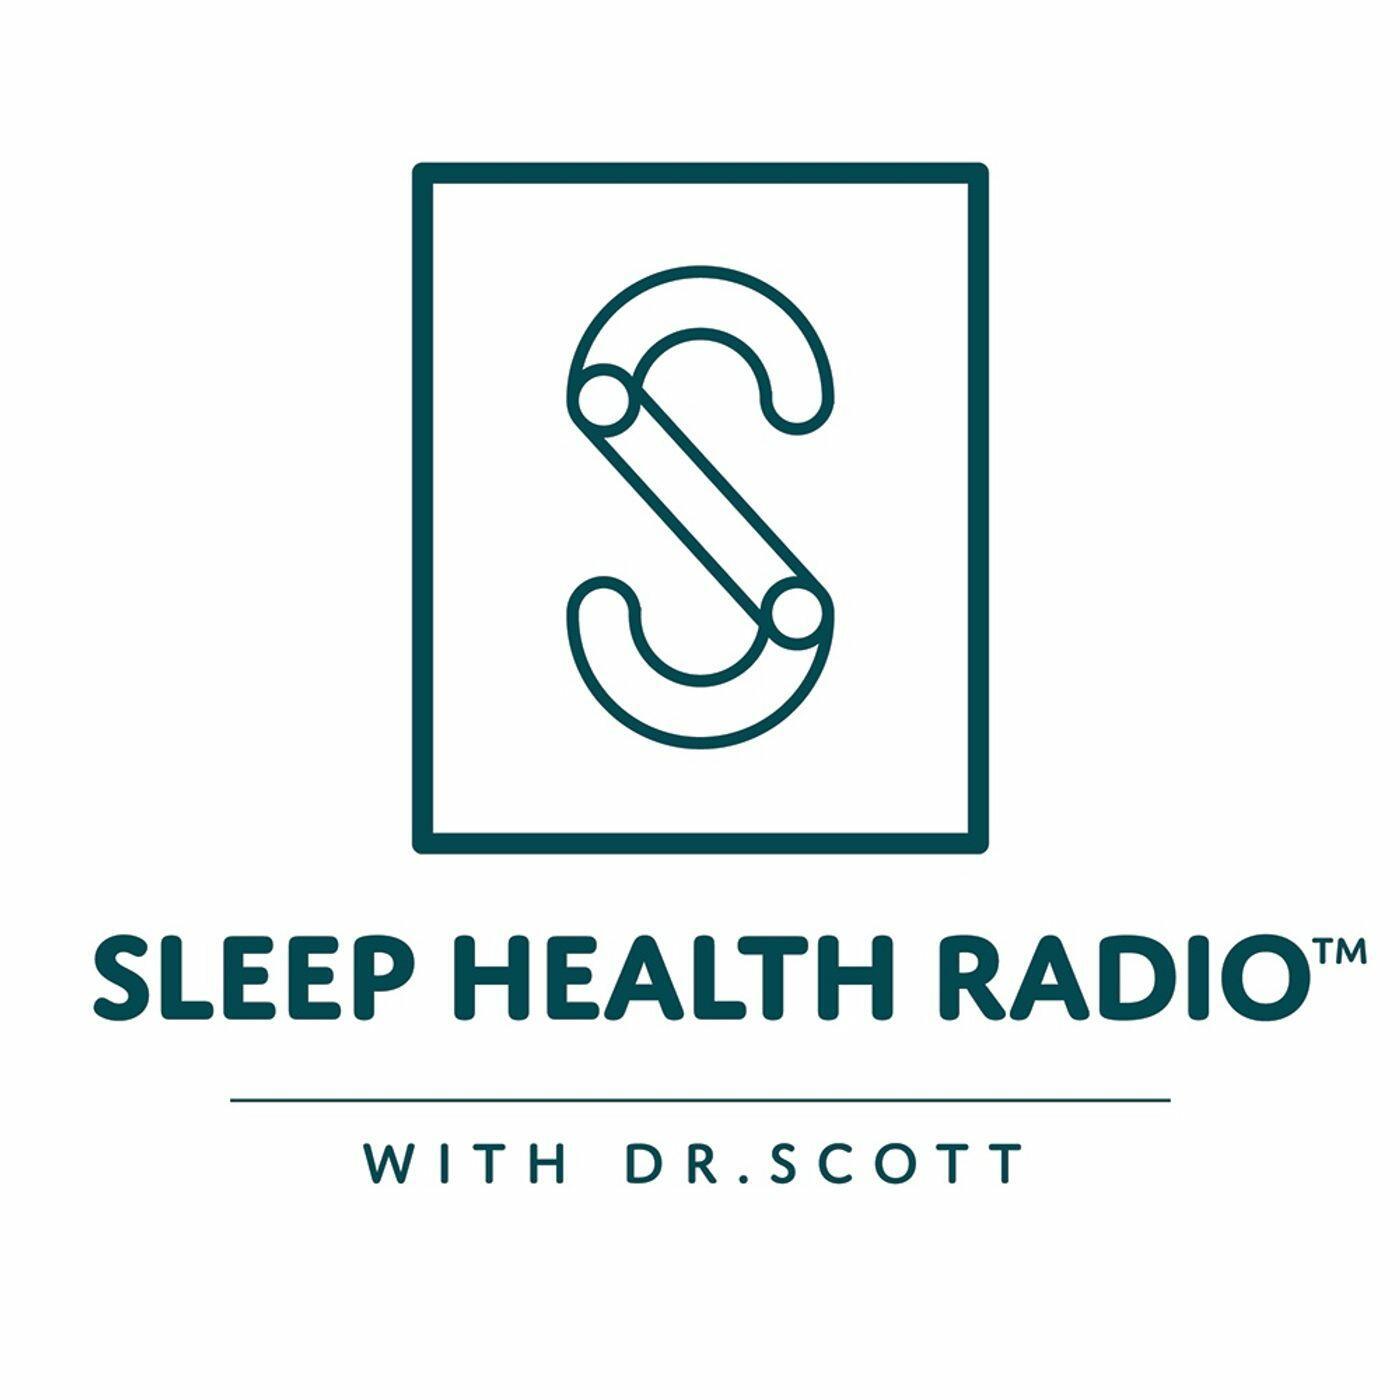 Sleep Health Radio With Dr. Scott